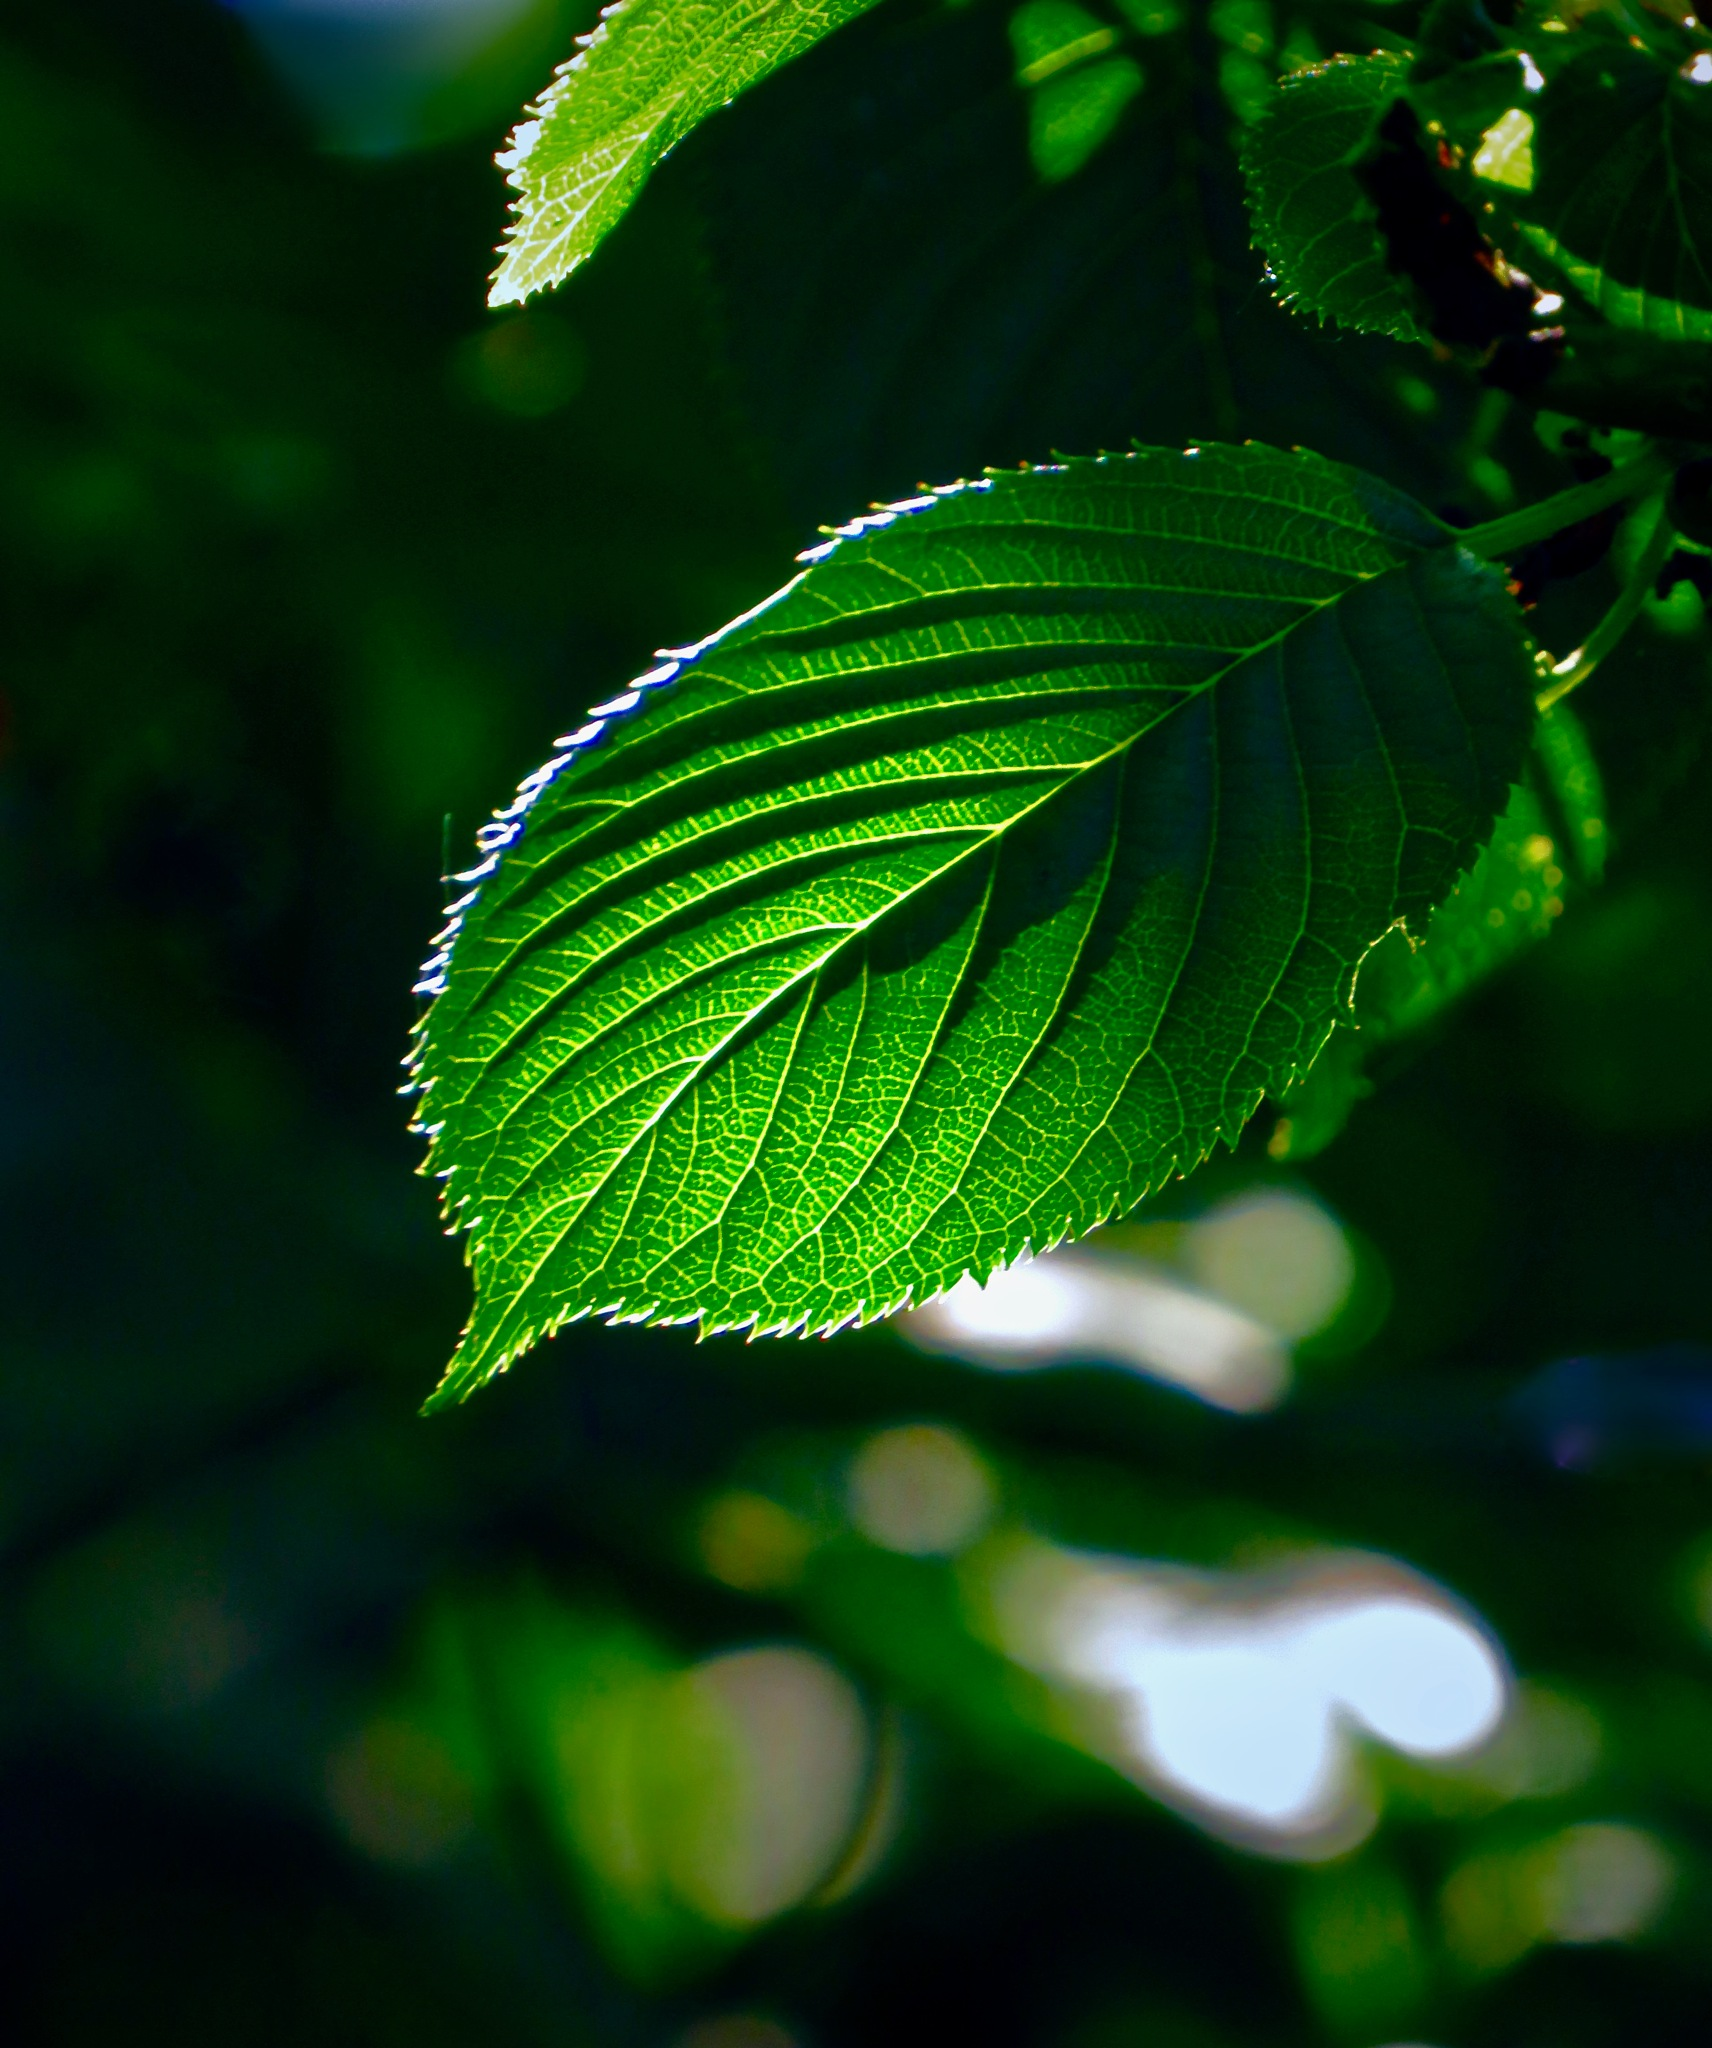 spring fresh n fulla green ... kinda like natures ice cream !! by David Devion